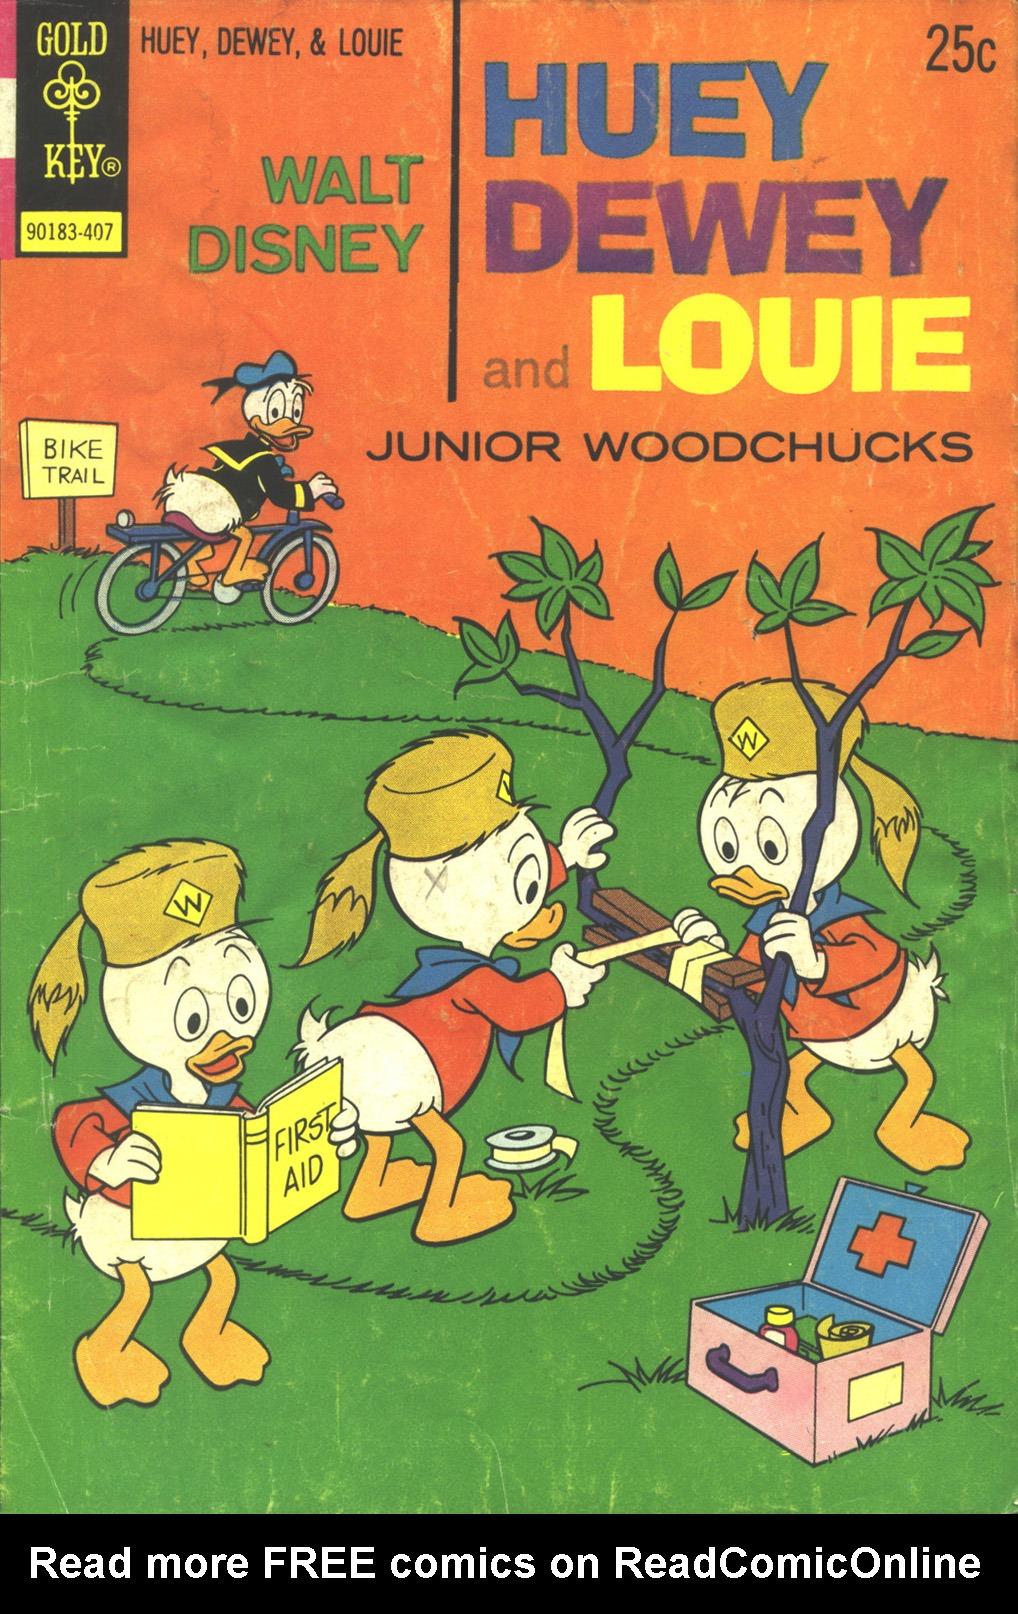 Huey, Dewey, and Louie Junior Woodchucks 27 Page 1